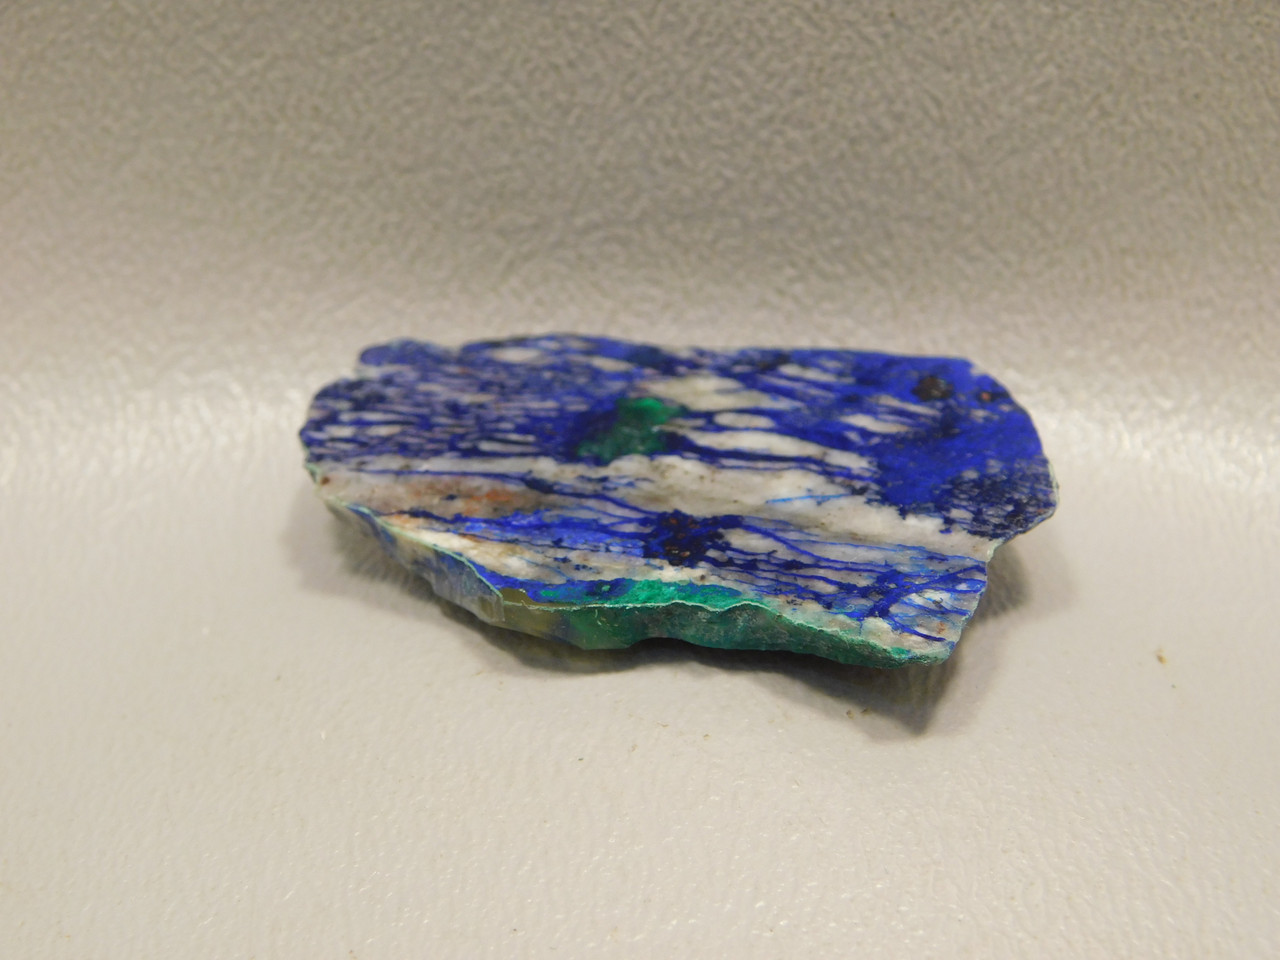 Azurite Malachite Cabochon Natural Shaped Small Polished Stone Slab #S5